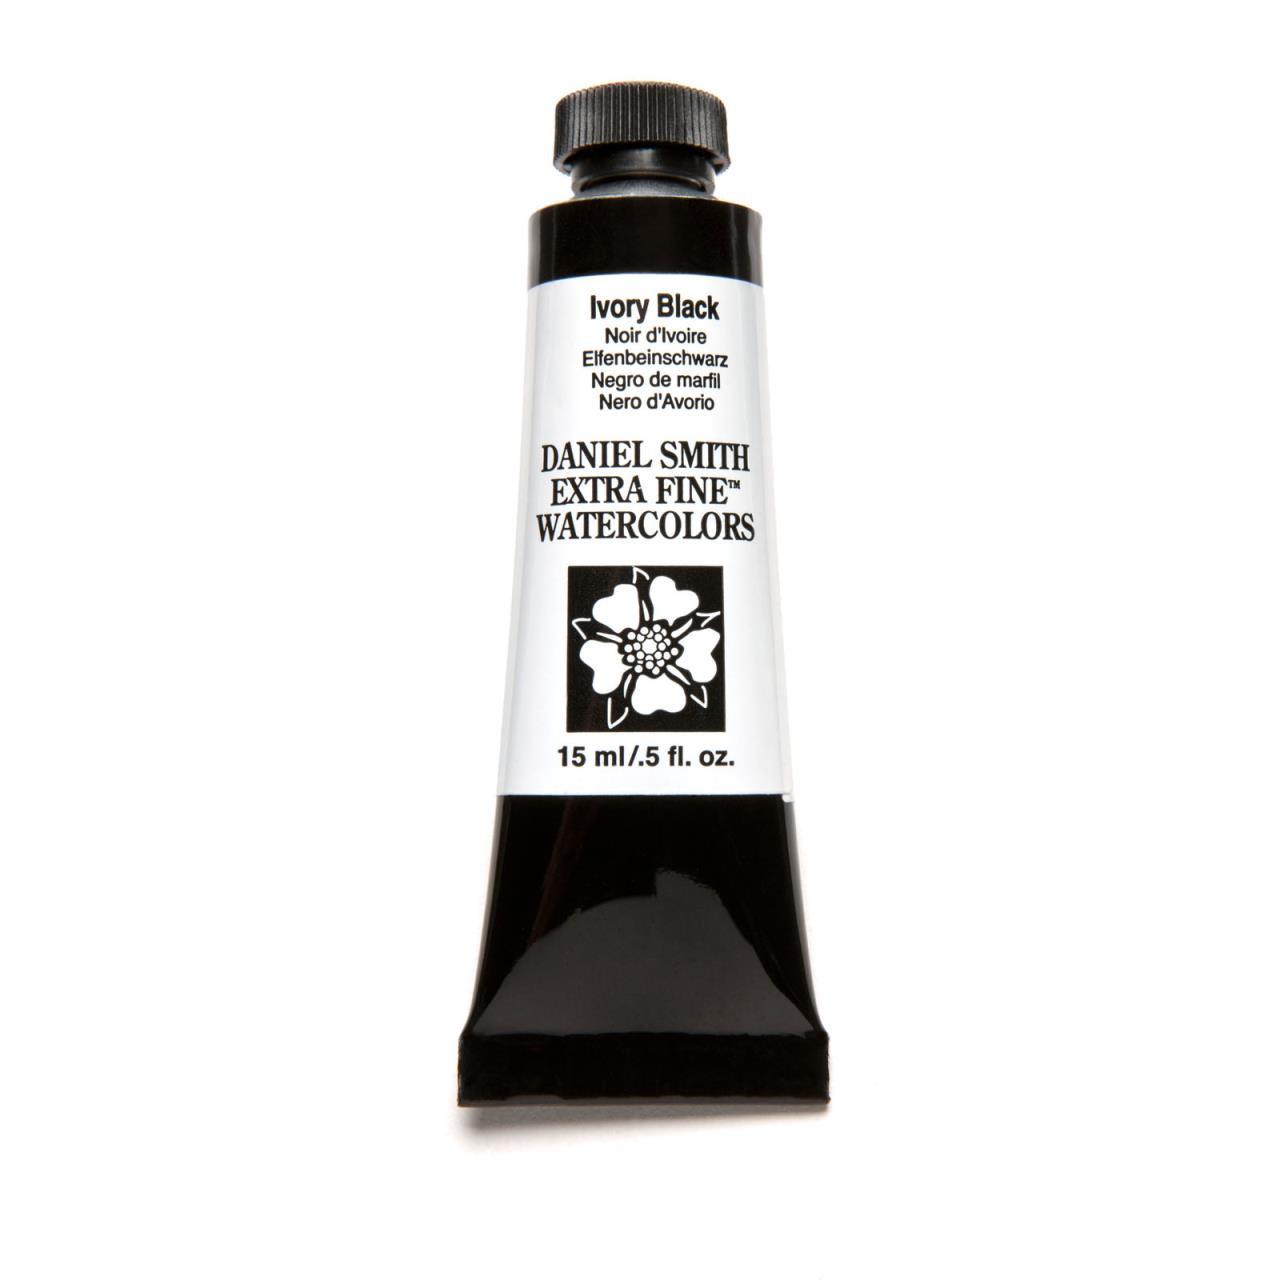 Ivory Black, DANIEL SMITH Extra Fine Watercolors 15ml Tubes -